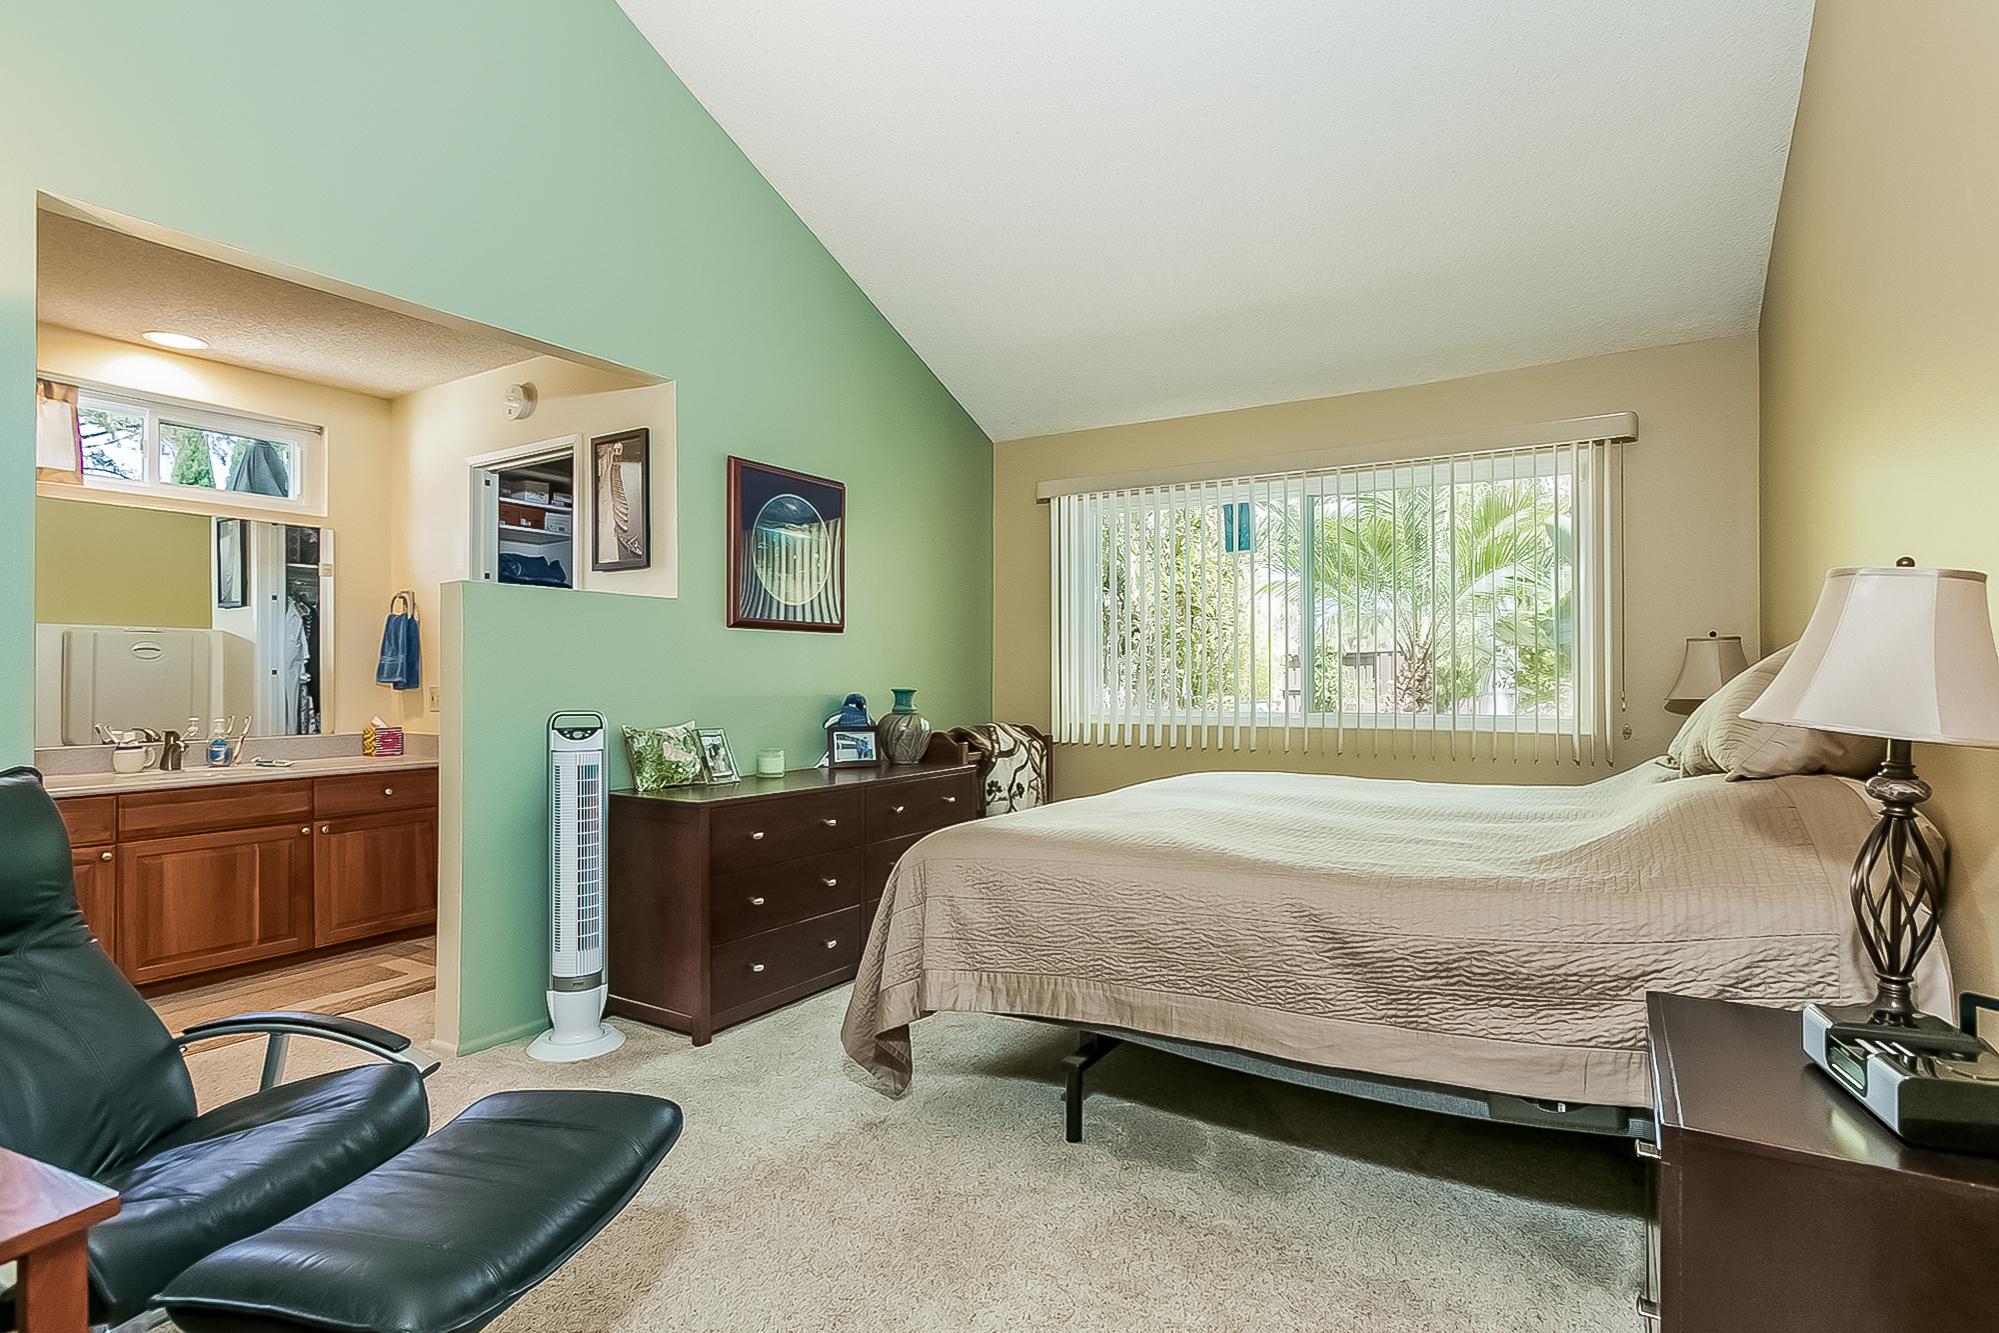 019-Master_Bedroom-2687485-large.jpg